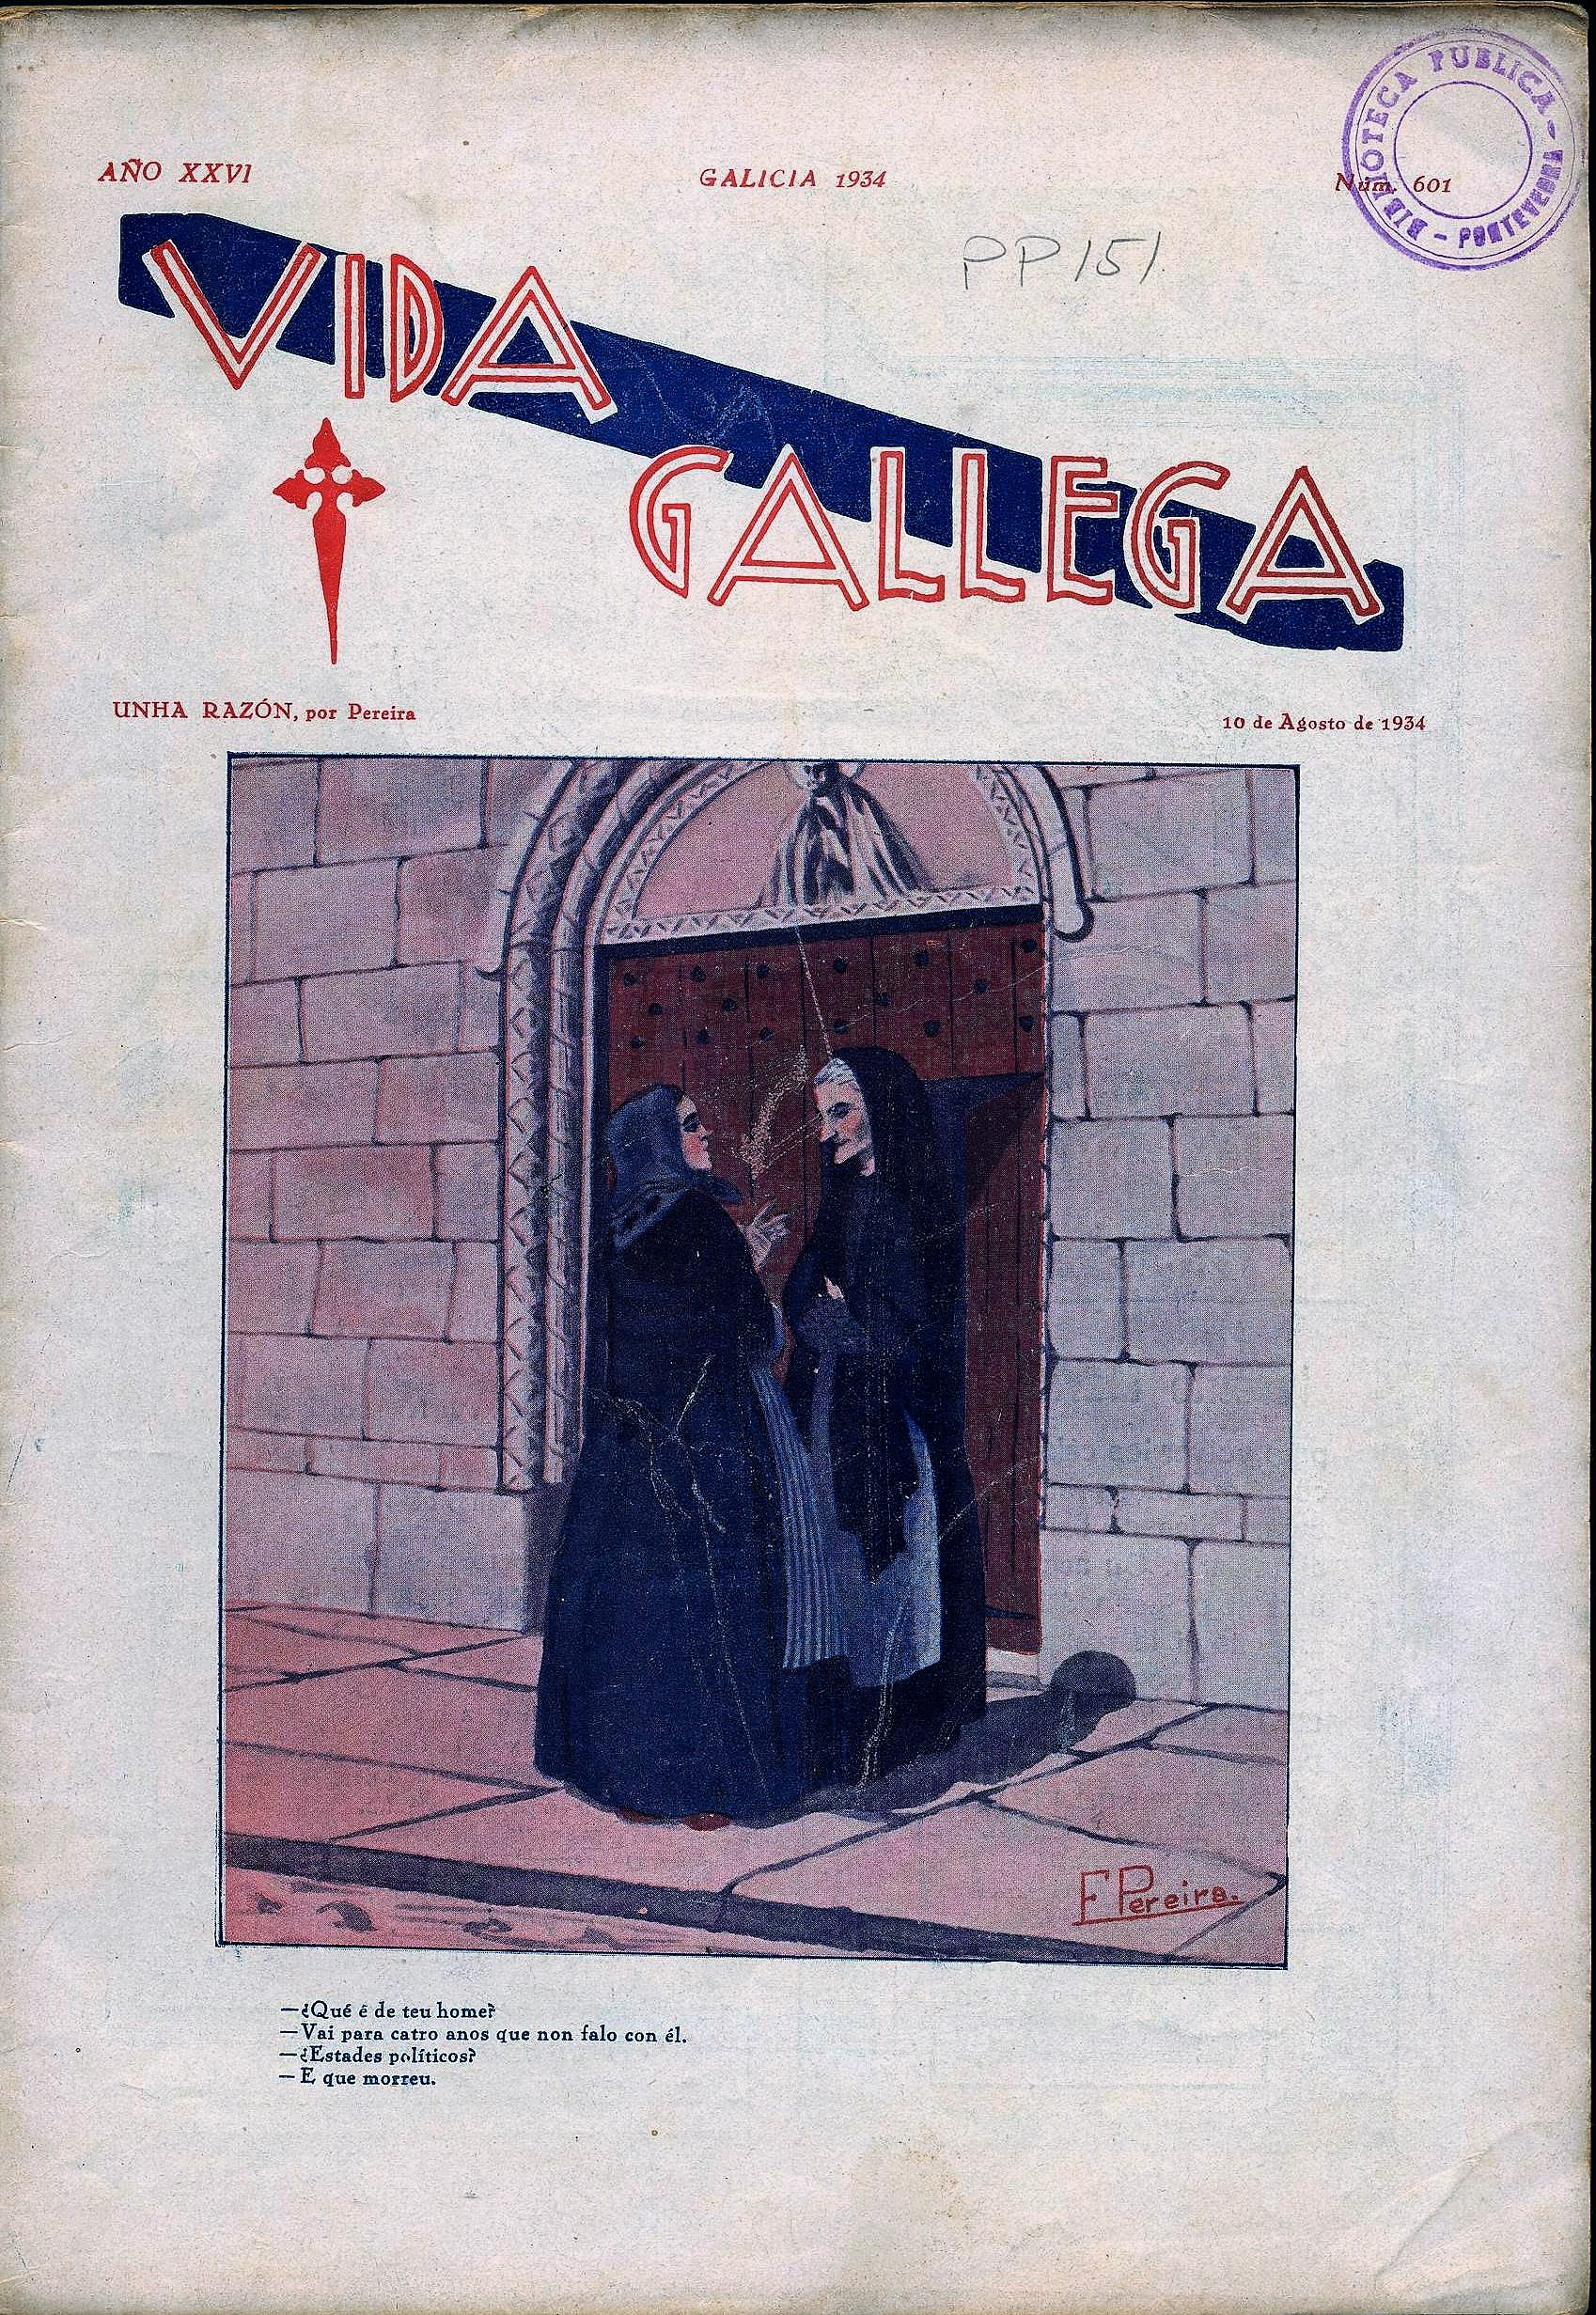 6_portada vida gallega 1934